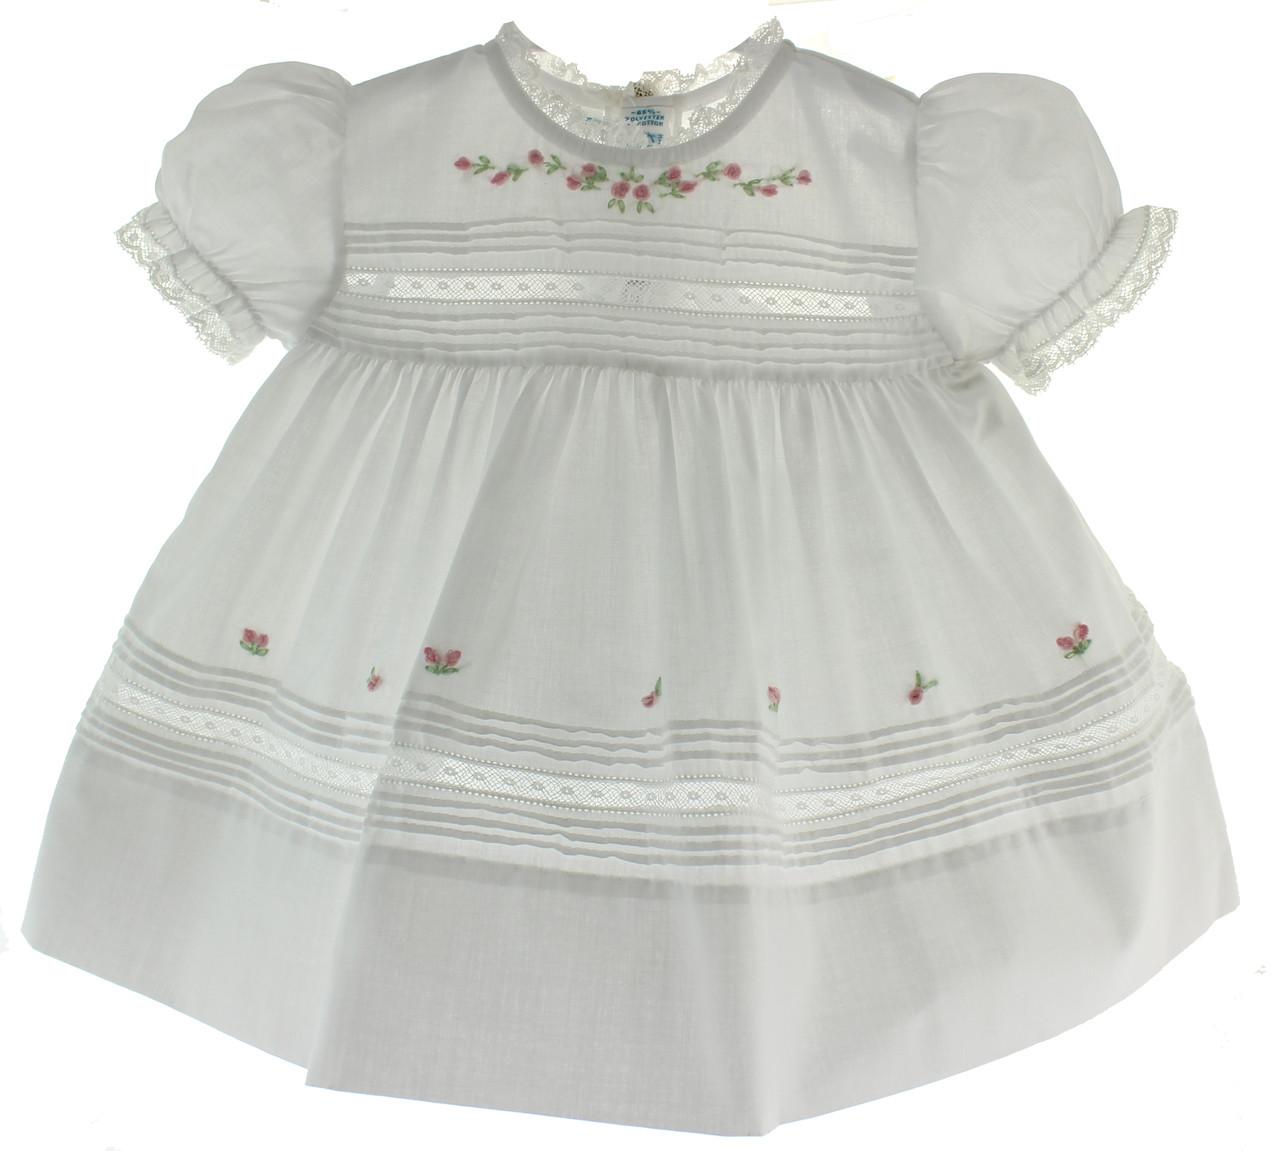 eab6f1216 Girls White Newborn Coming Home Dress with Lace Trim Feltman ...